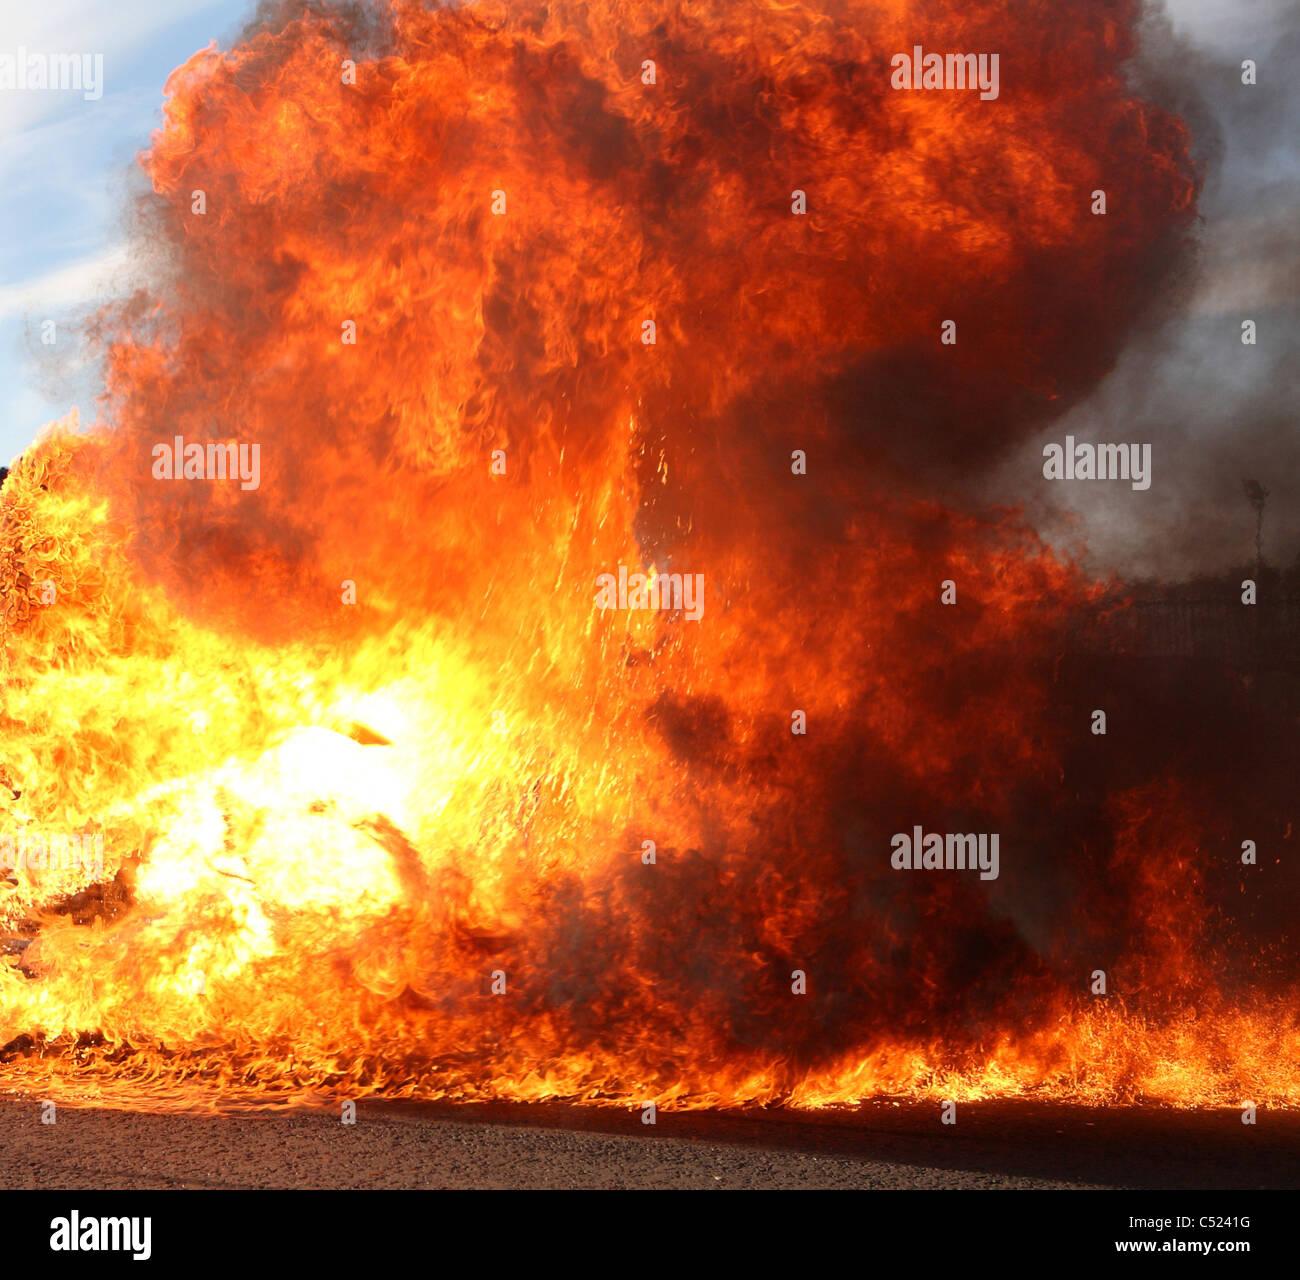 blazing inferno - Stock Image